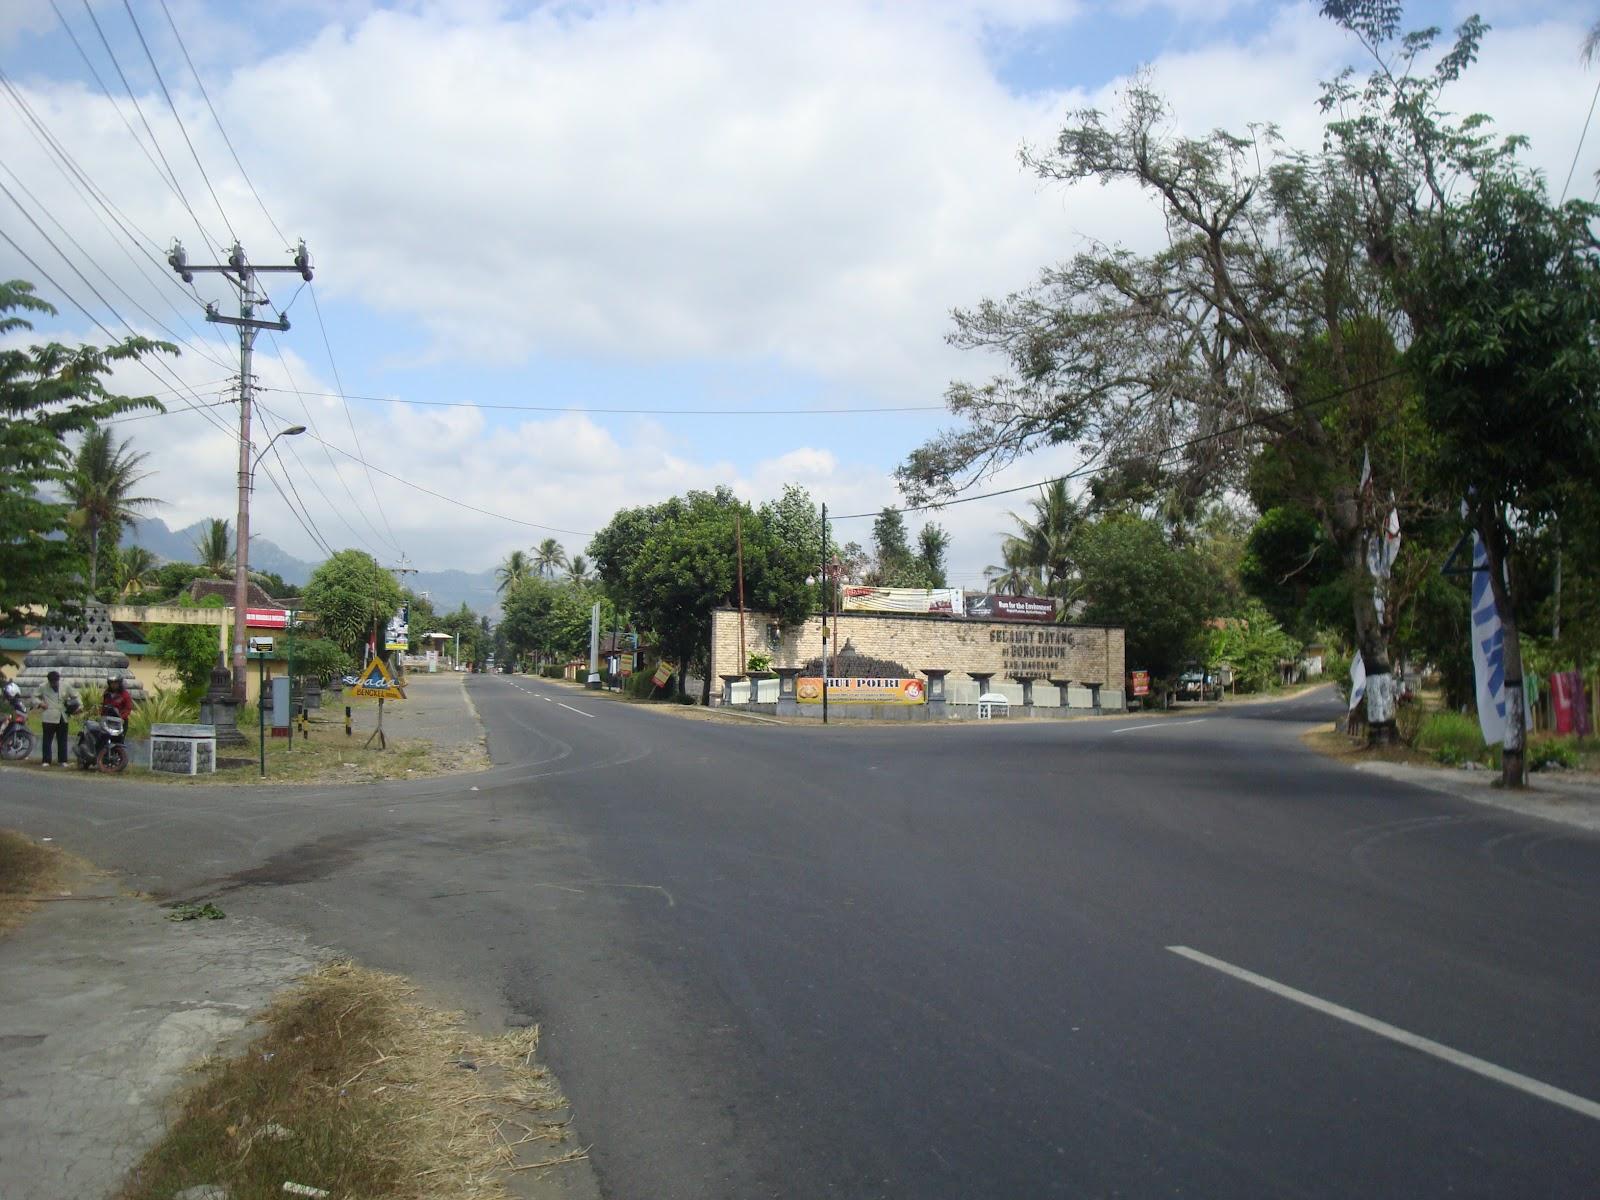 Desa Wisata Wanurejo Alam Wanurejo